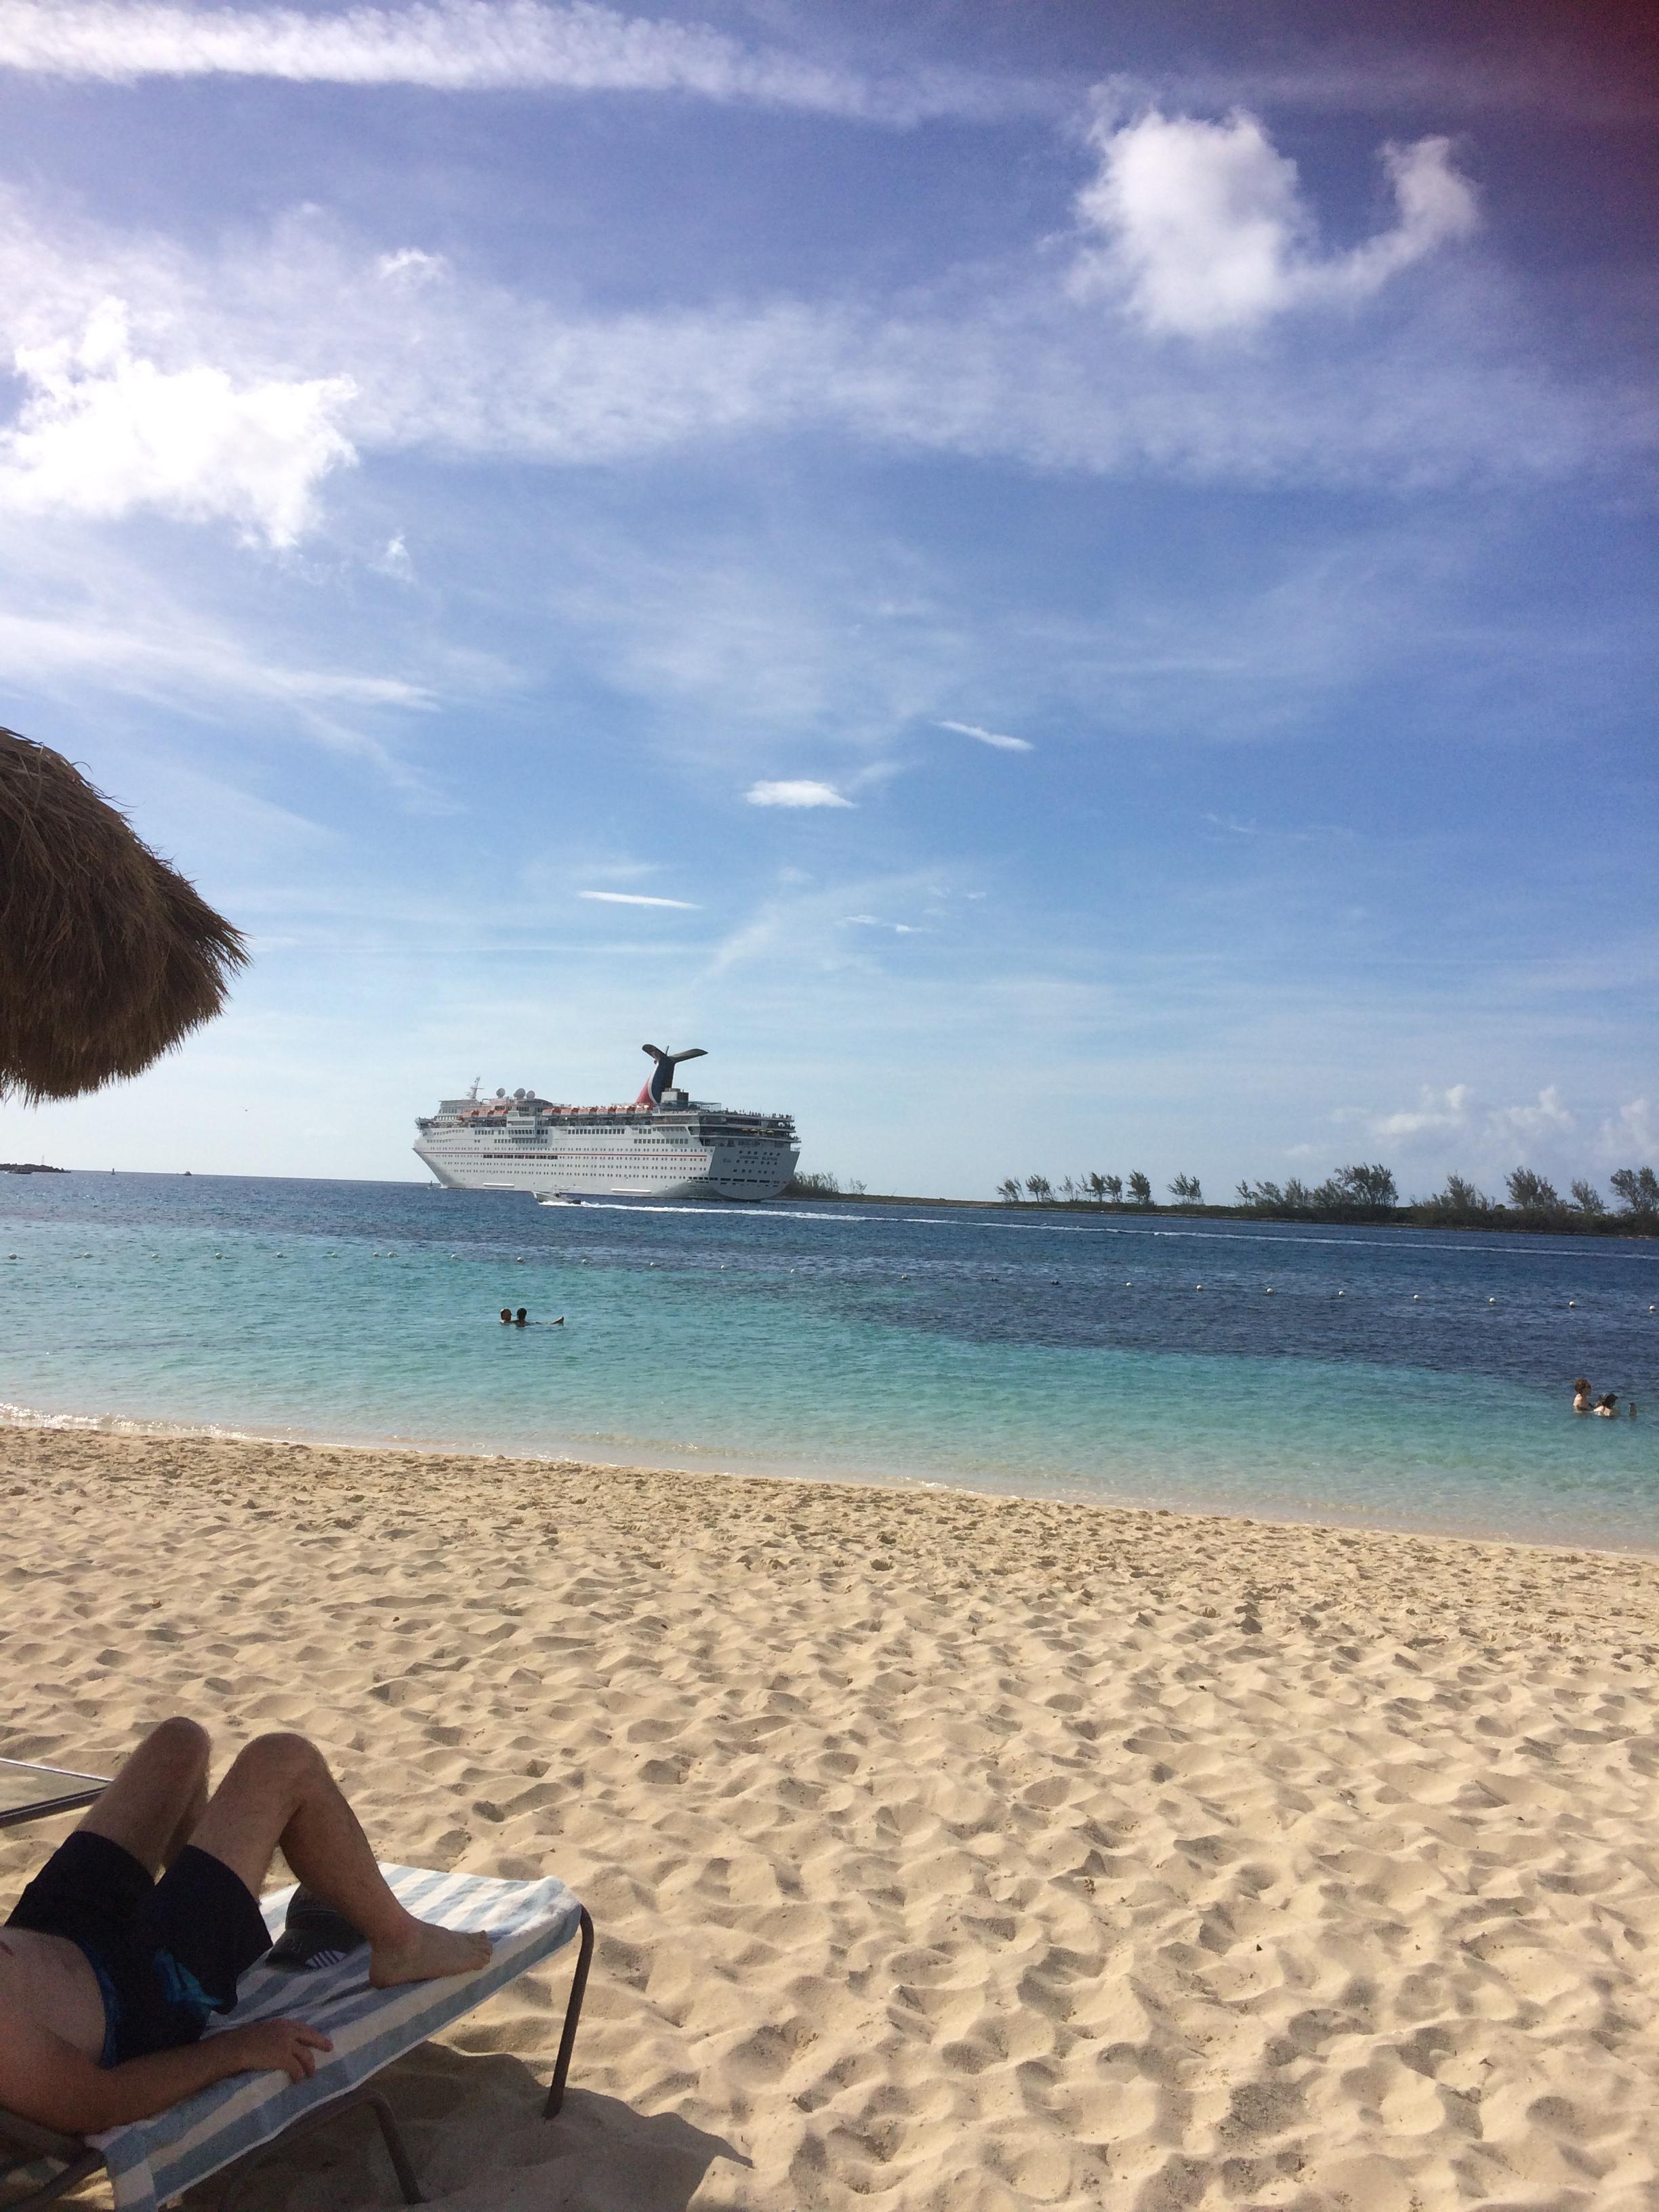 the private beach view